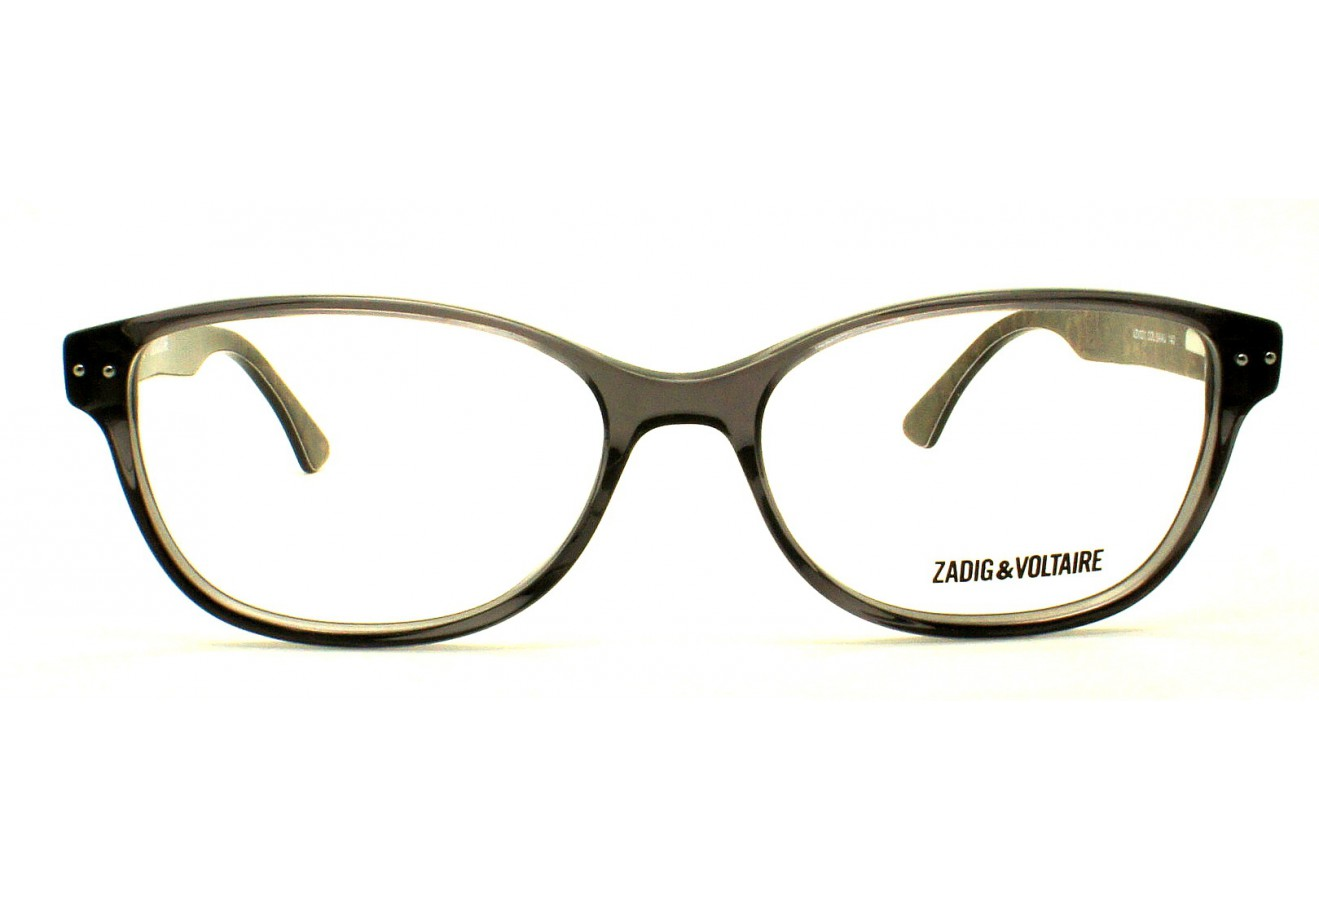 lunettes de vue zadig et voltaire vzv 021 0aau 53 16. Black Bedroom Furniture Sets. Home Design Ideas